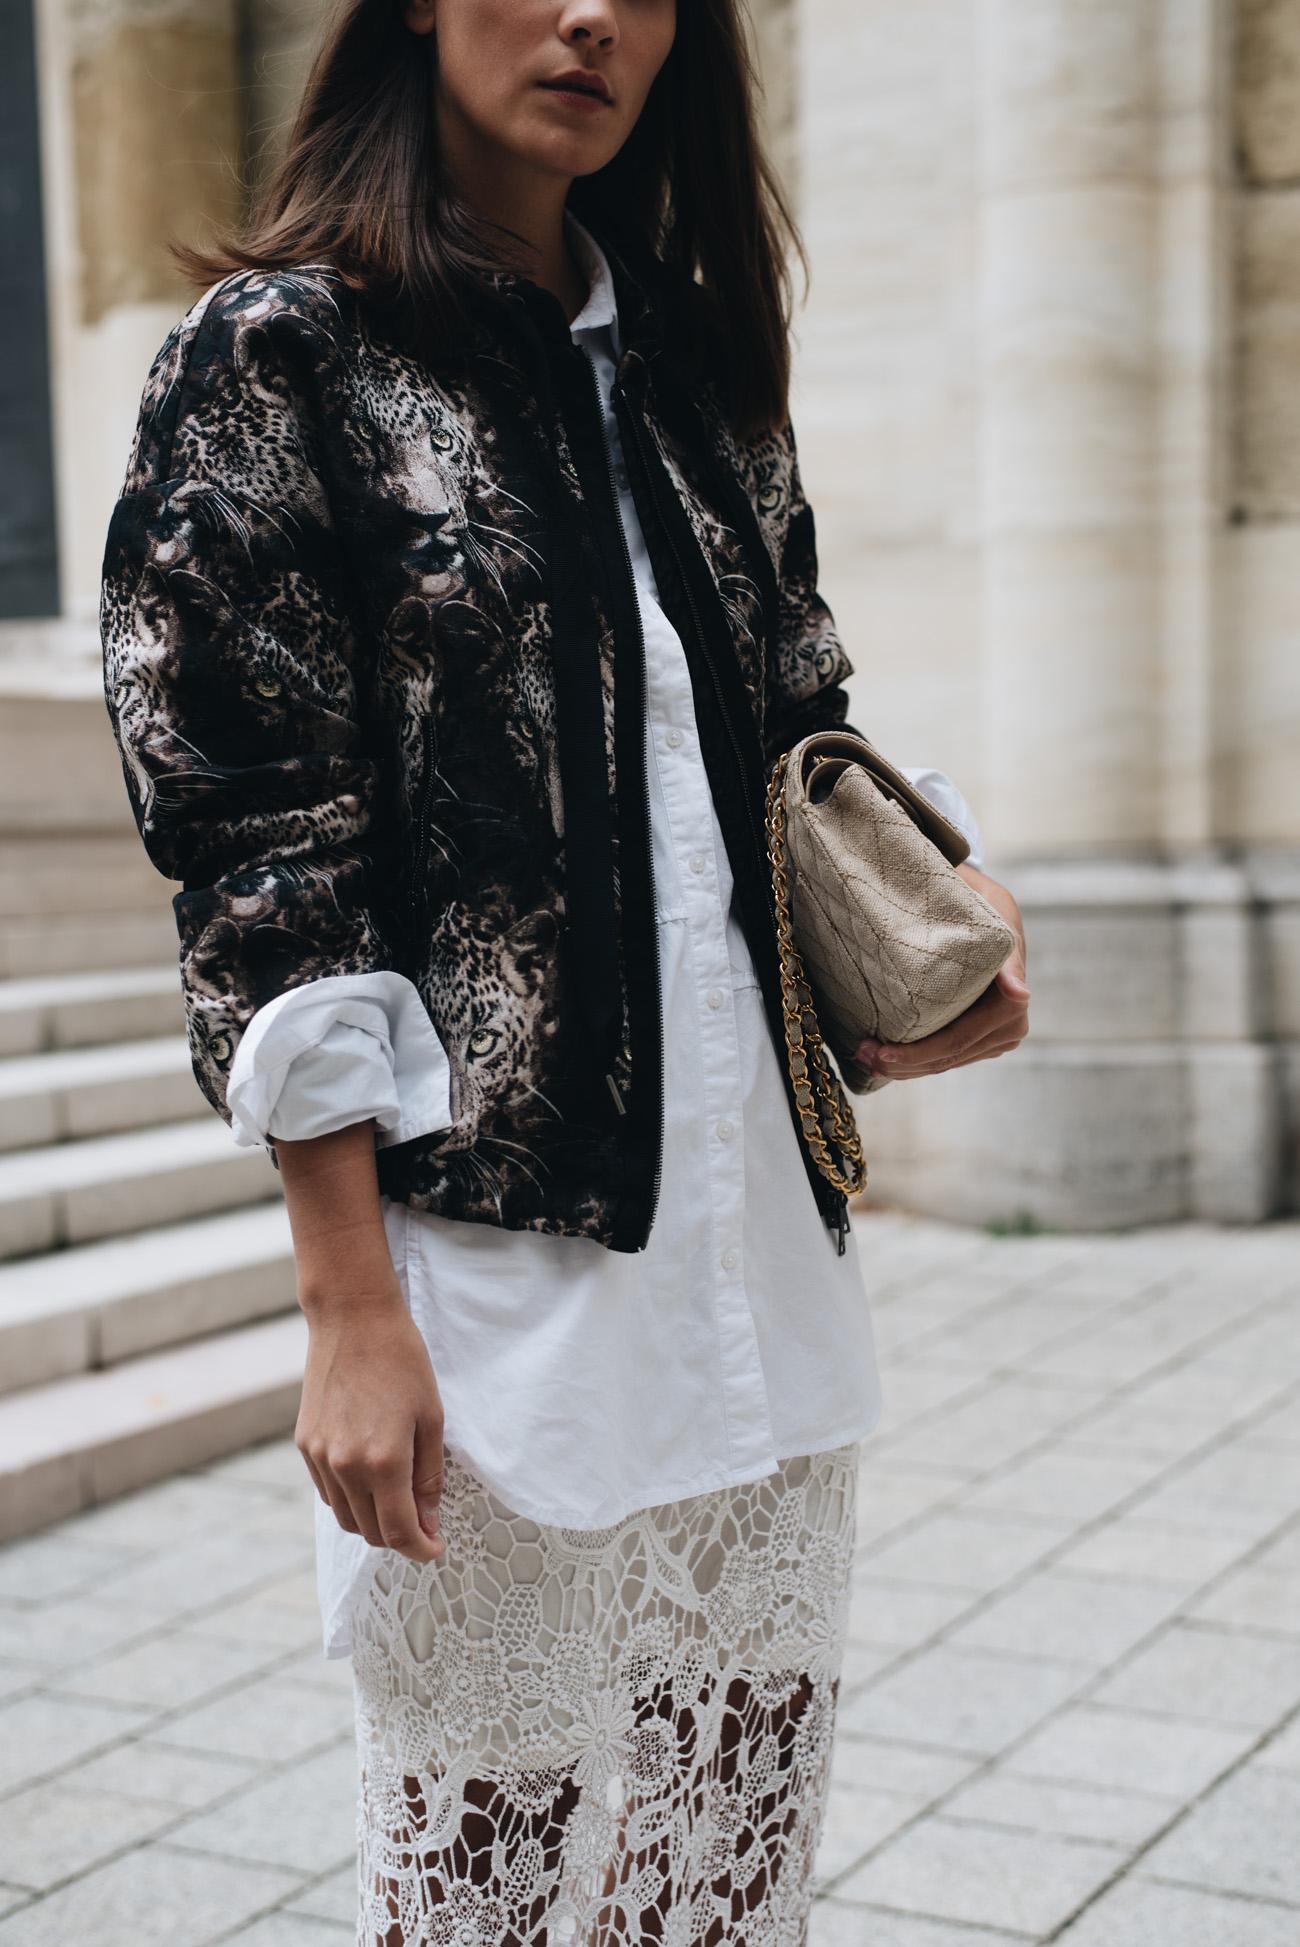 weisse-basic-bluse-tragen-leoparden-bomberjacke-chanel-timeless-canvas-nina-schwichtenberg-fashiioncarpet